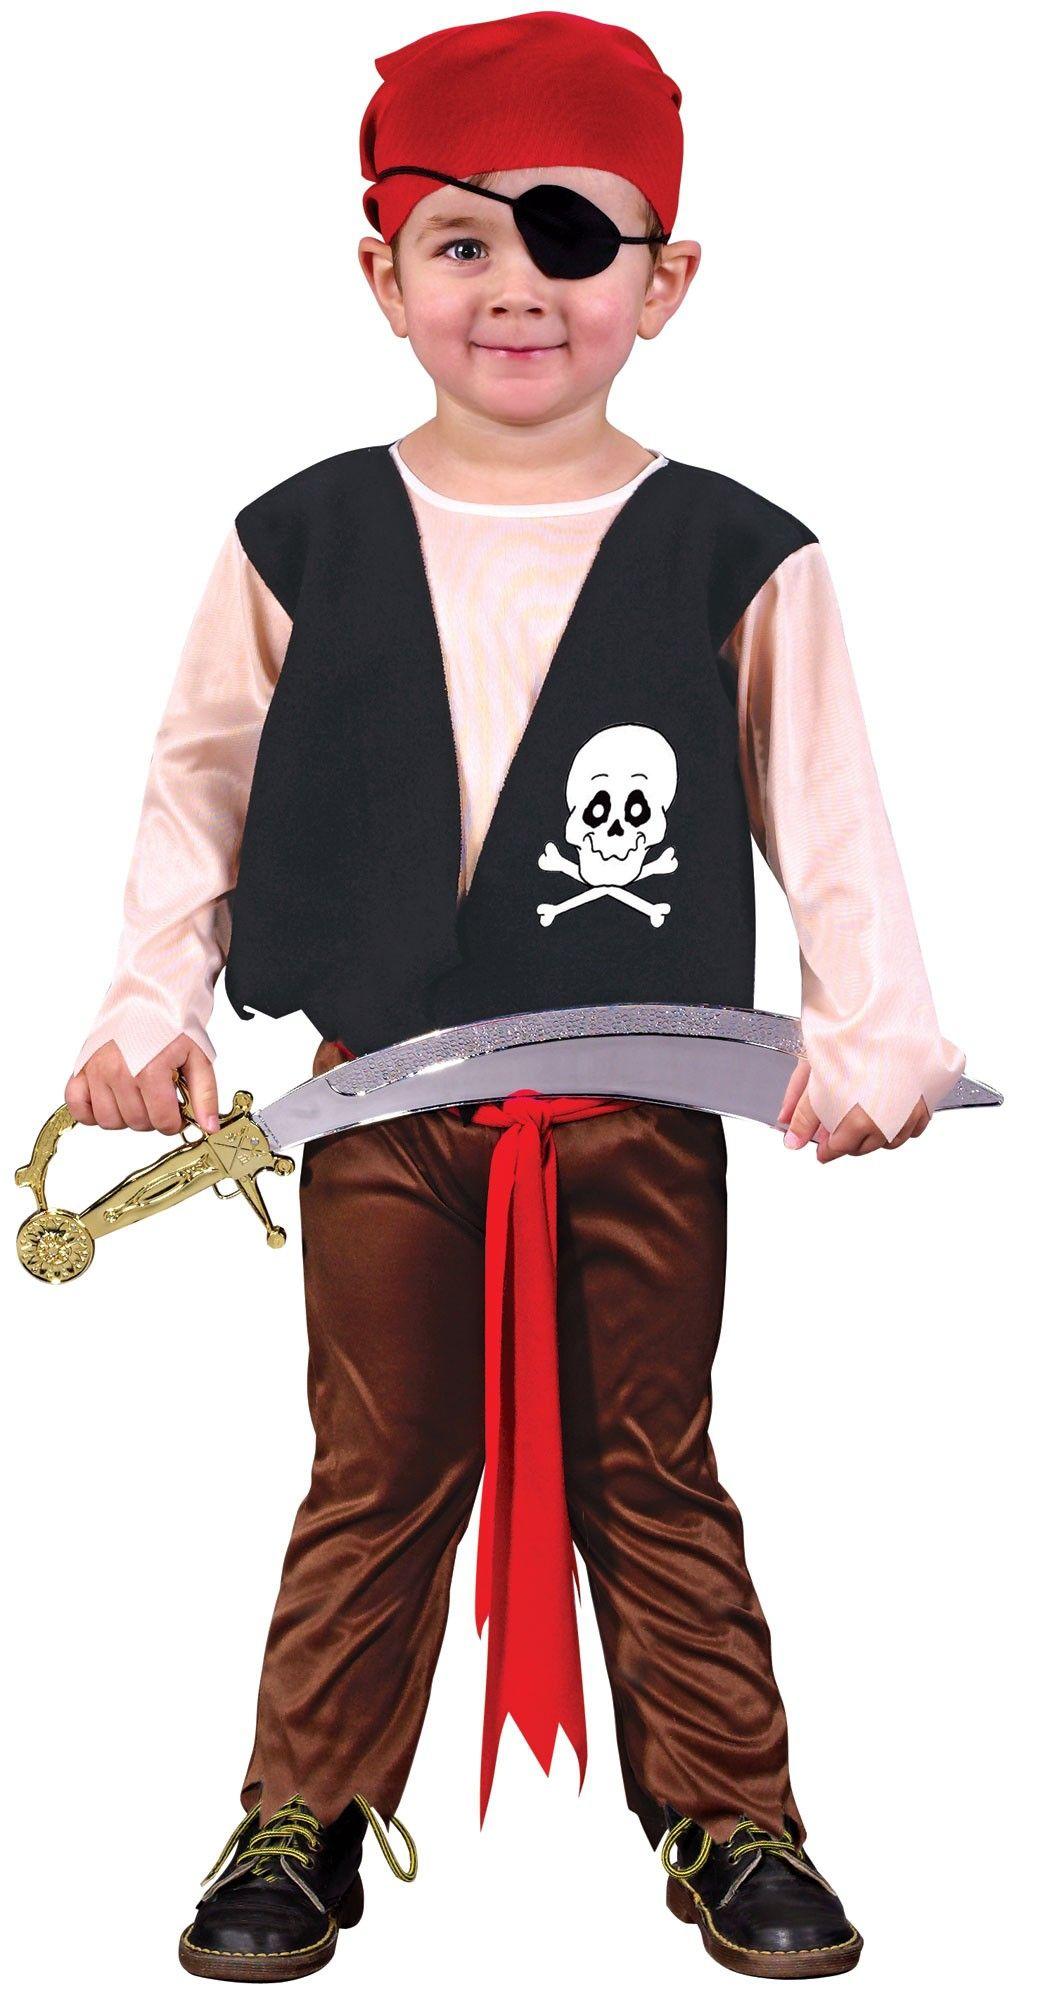 Детский новогодний костюм пирата на мальчика фото